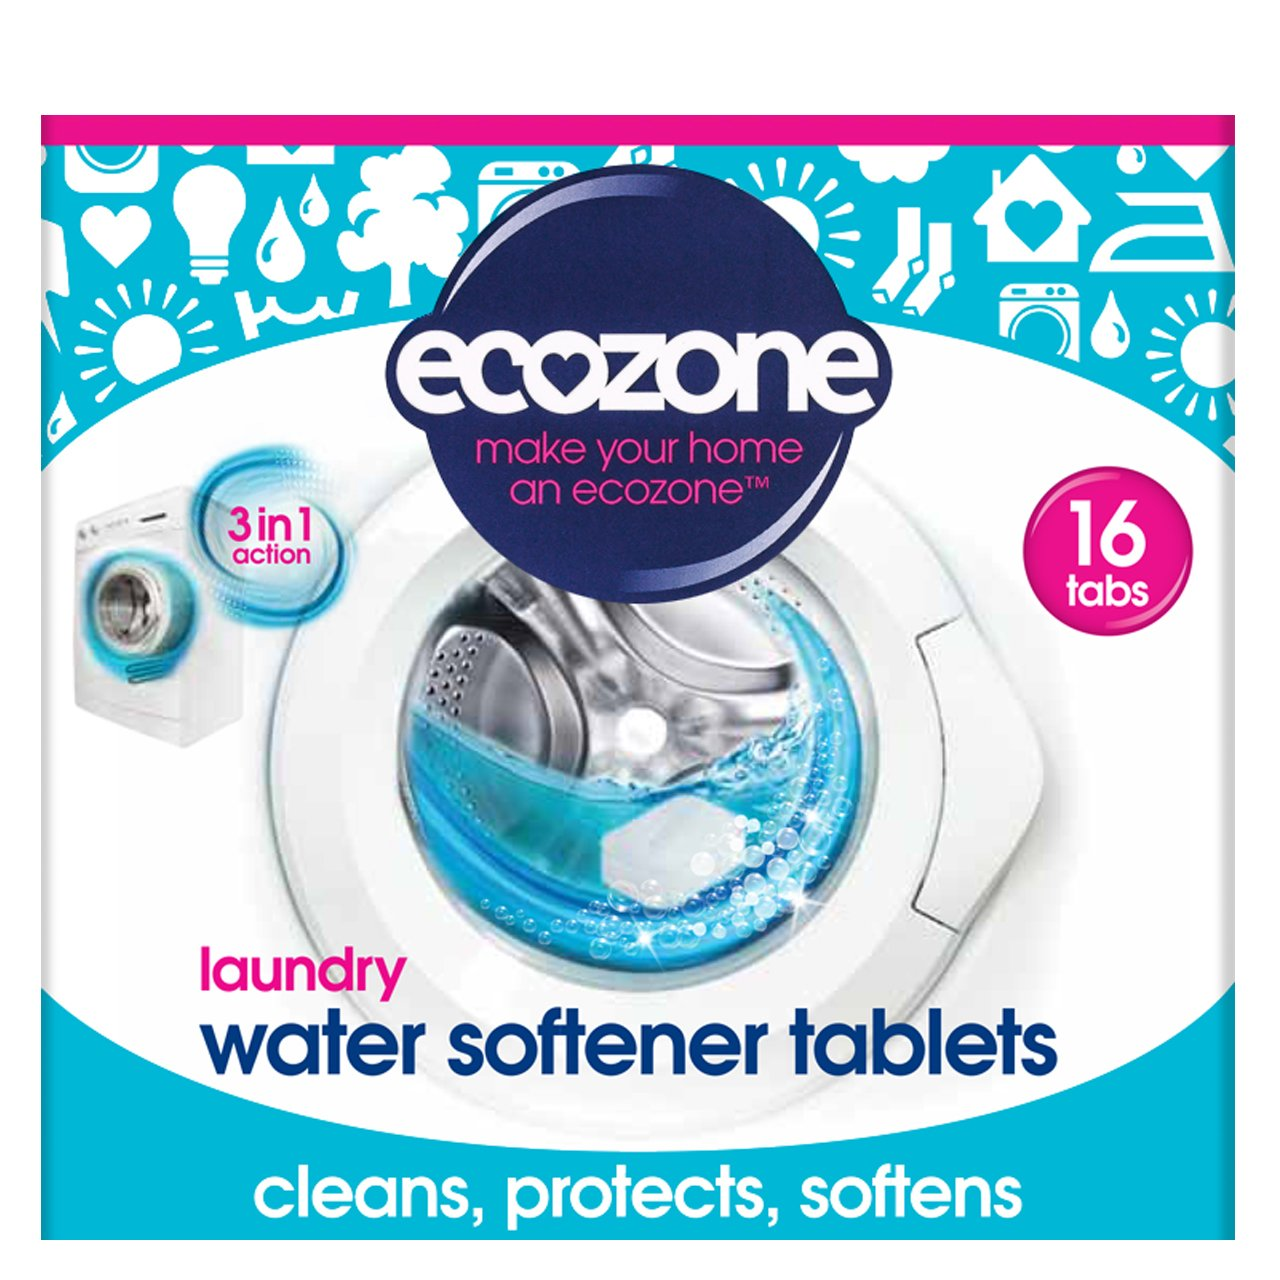 (6 PACK) - Ecozone Water Softner Tablets | 260g | 6 PACK - SUPER SAVER - SAVE MONEY Ecozone Ltd